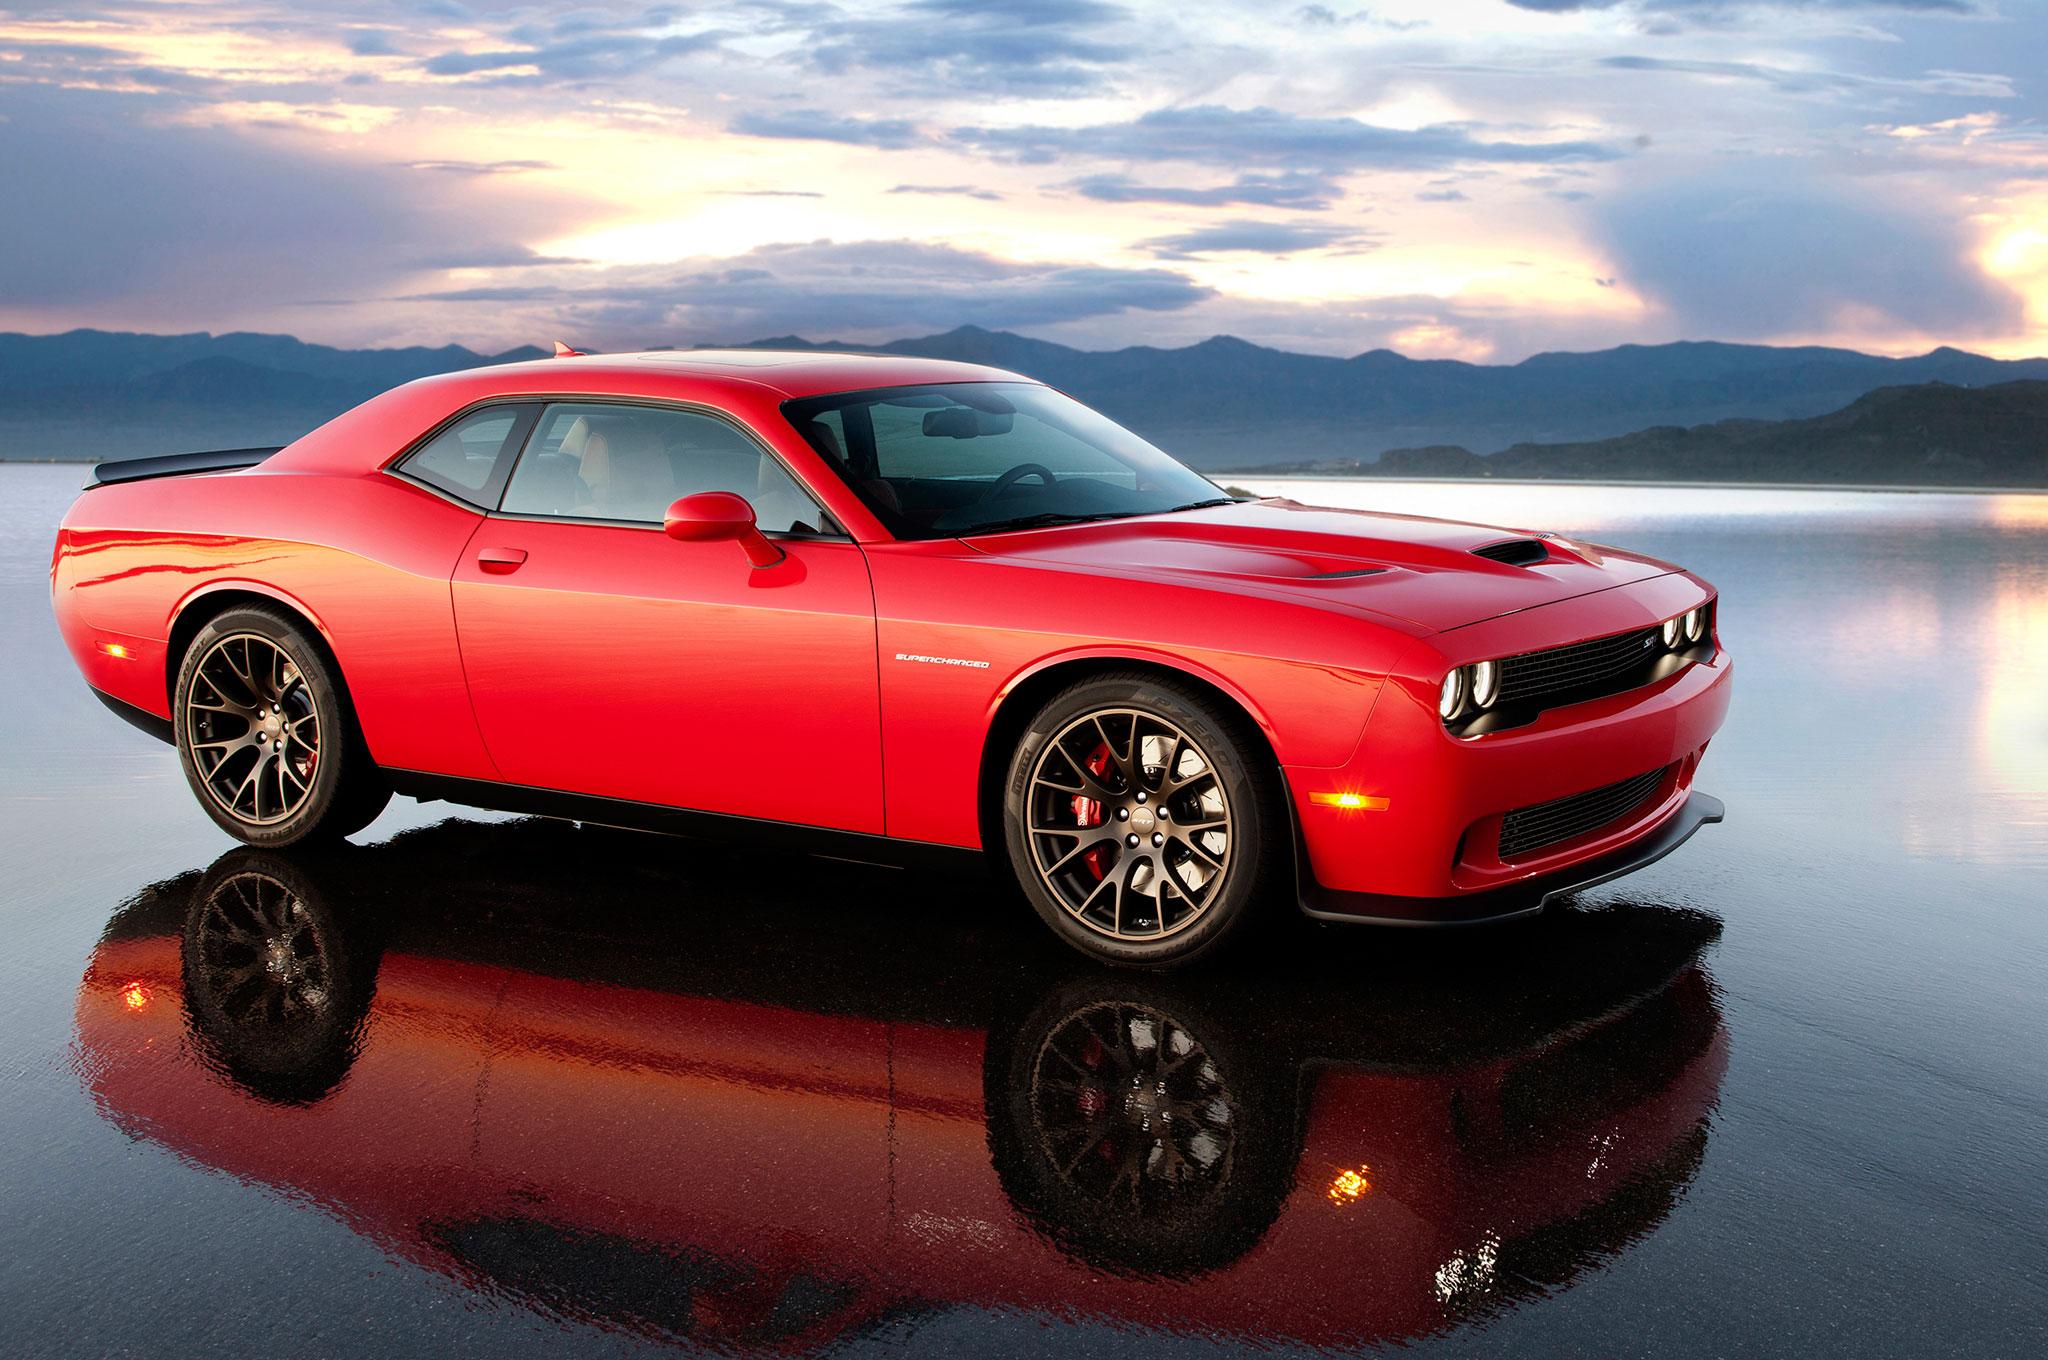 Fastest Muscle Car - 2015 Dodge Challenger SRT Hellcat